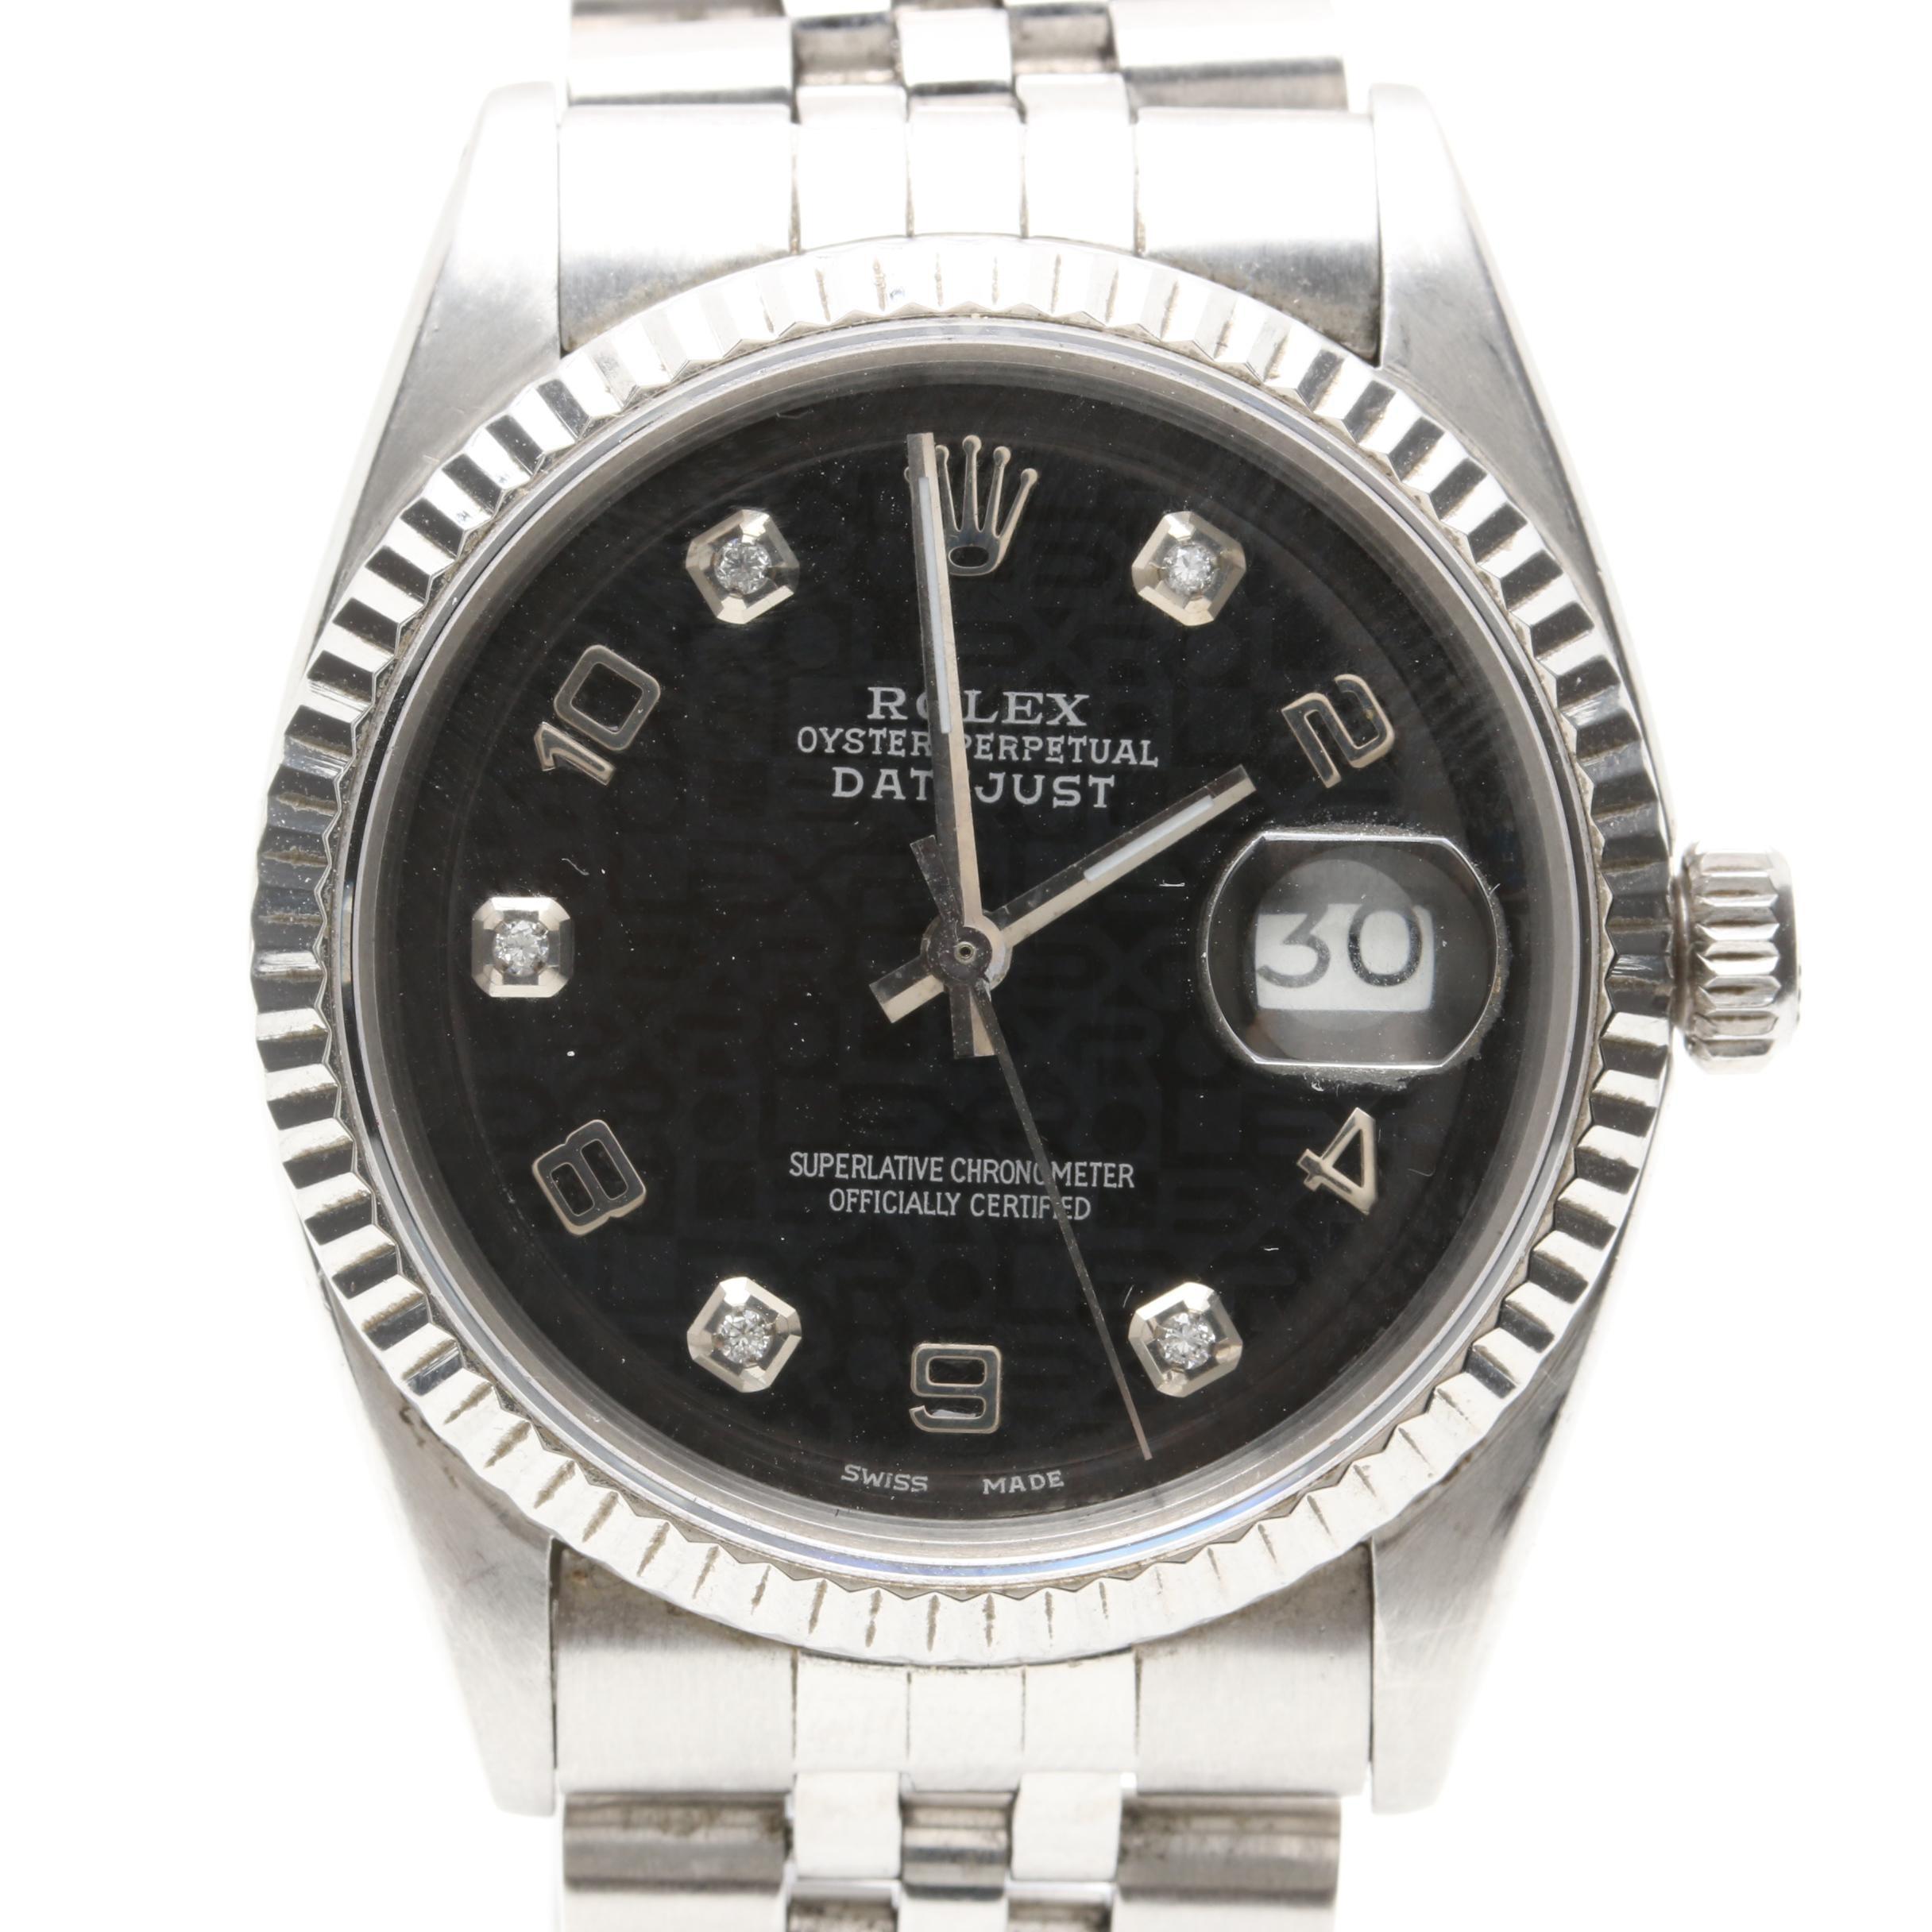 Rolex Datejust Oyster Perpetual Diamond Wristwatch